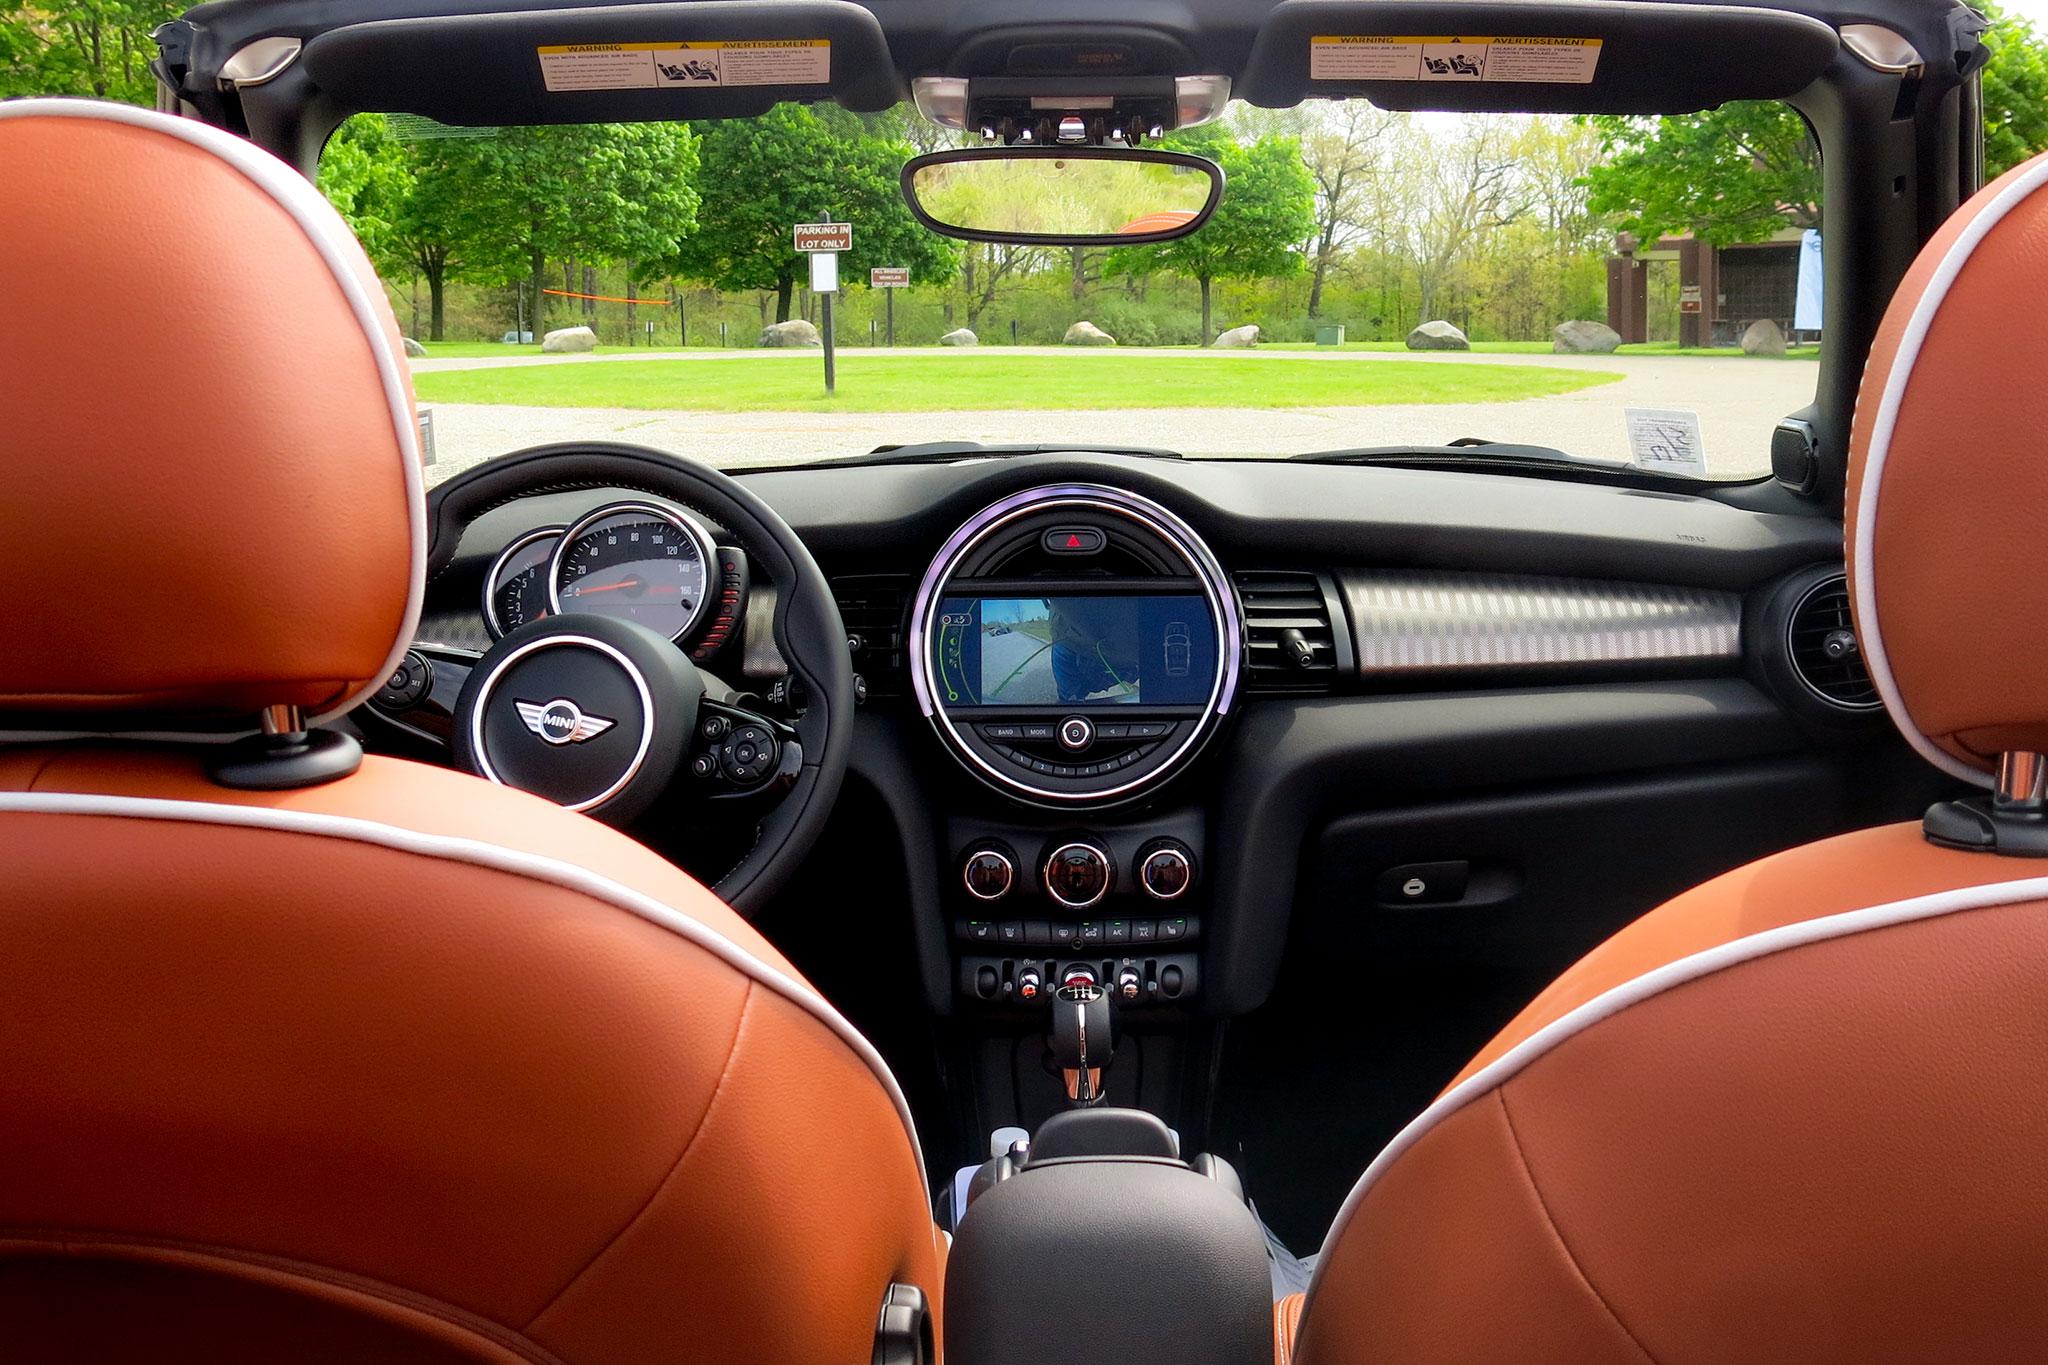 2016 Mini Cooper S Convertible Review